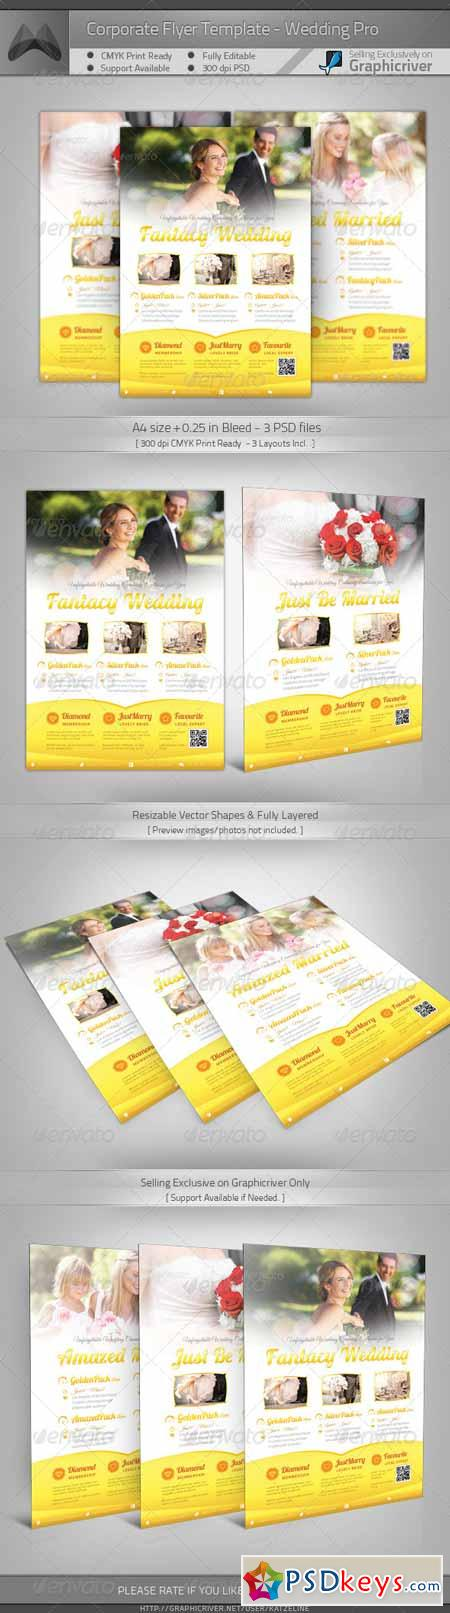 Corporate Flyer - Wedding Pro 4206019